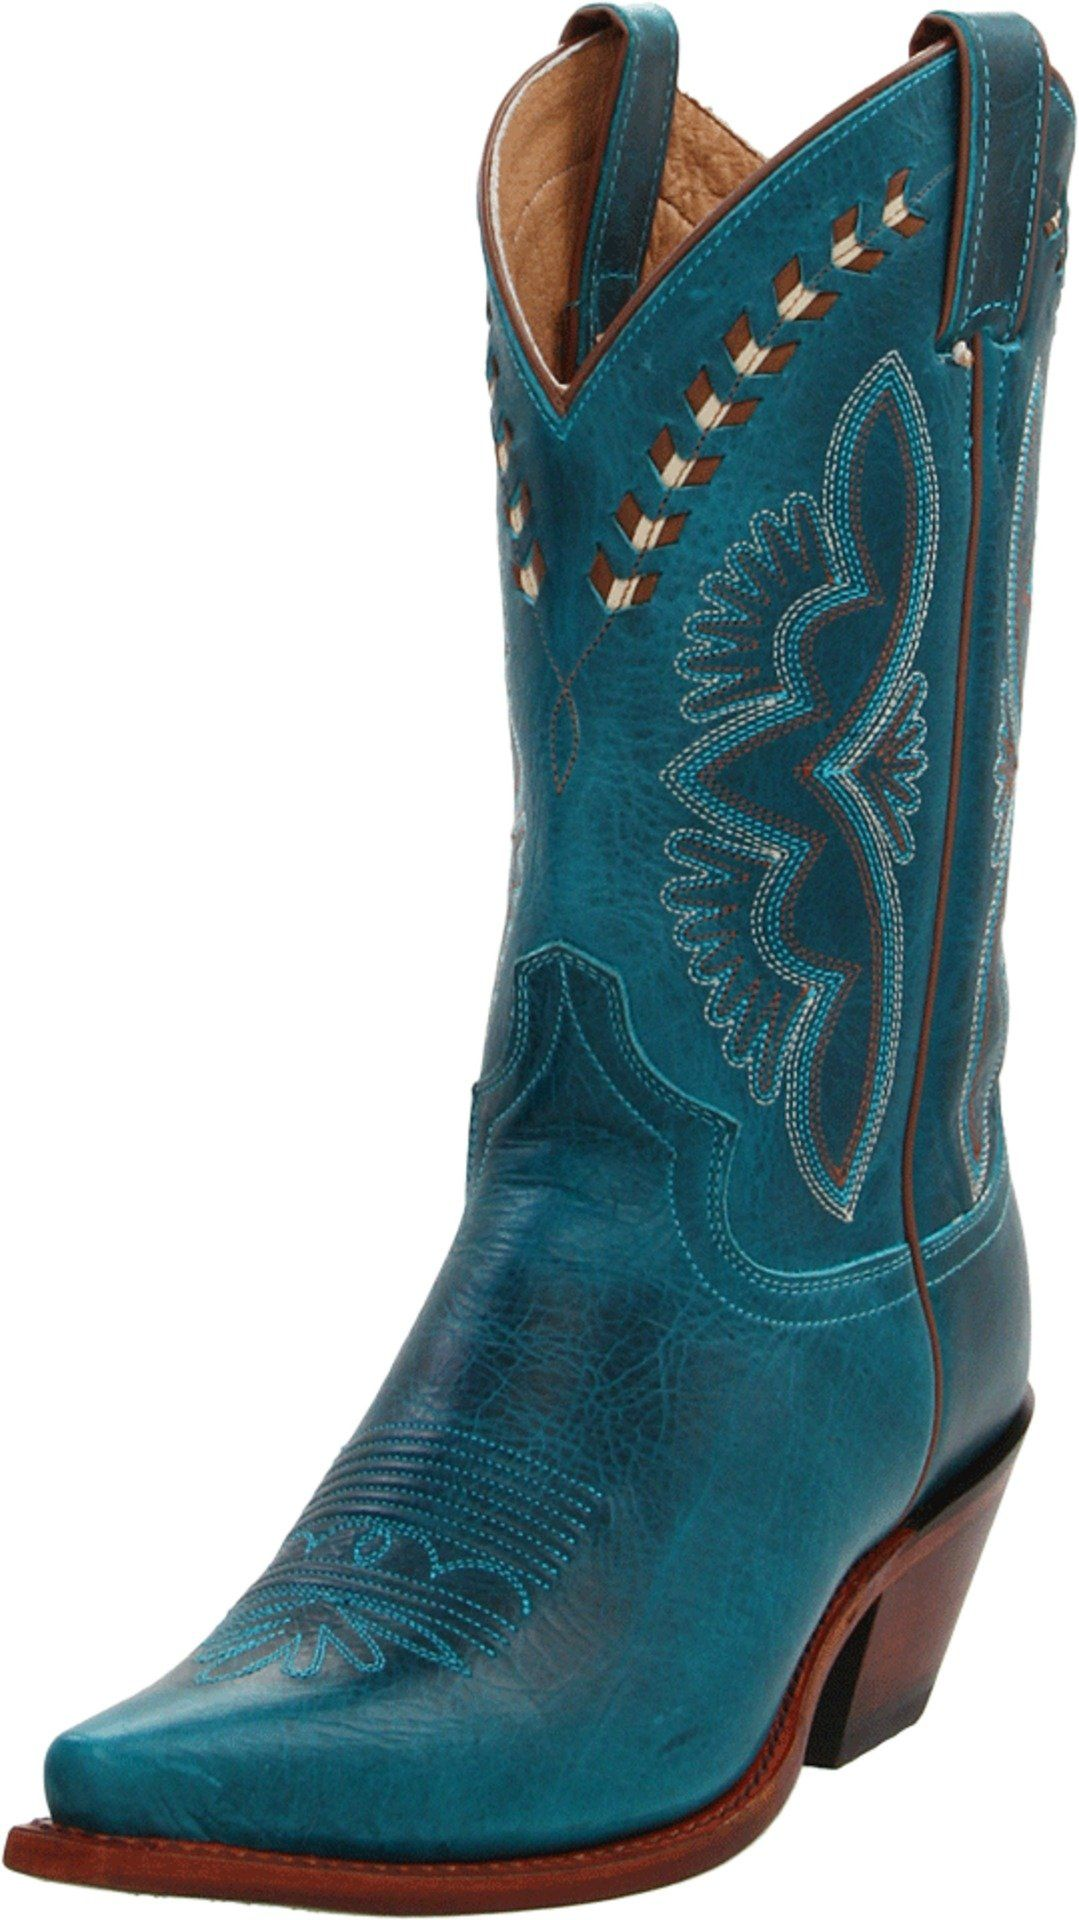 98c1d43bb2f Justin Boots Women's Western Fashion 11